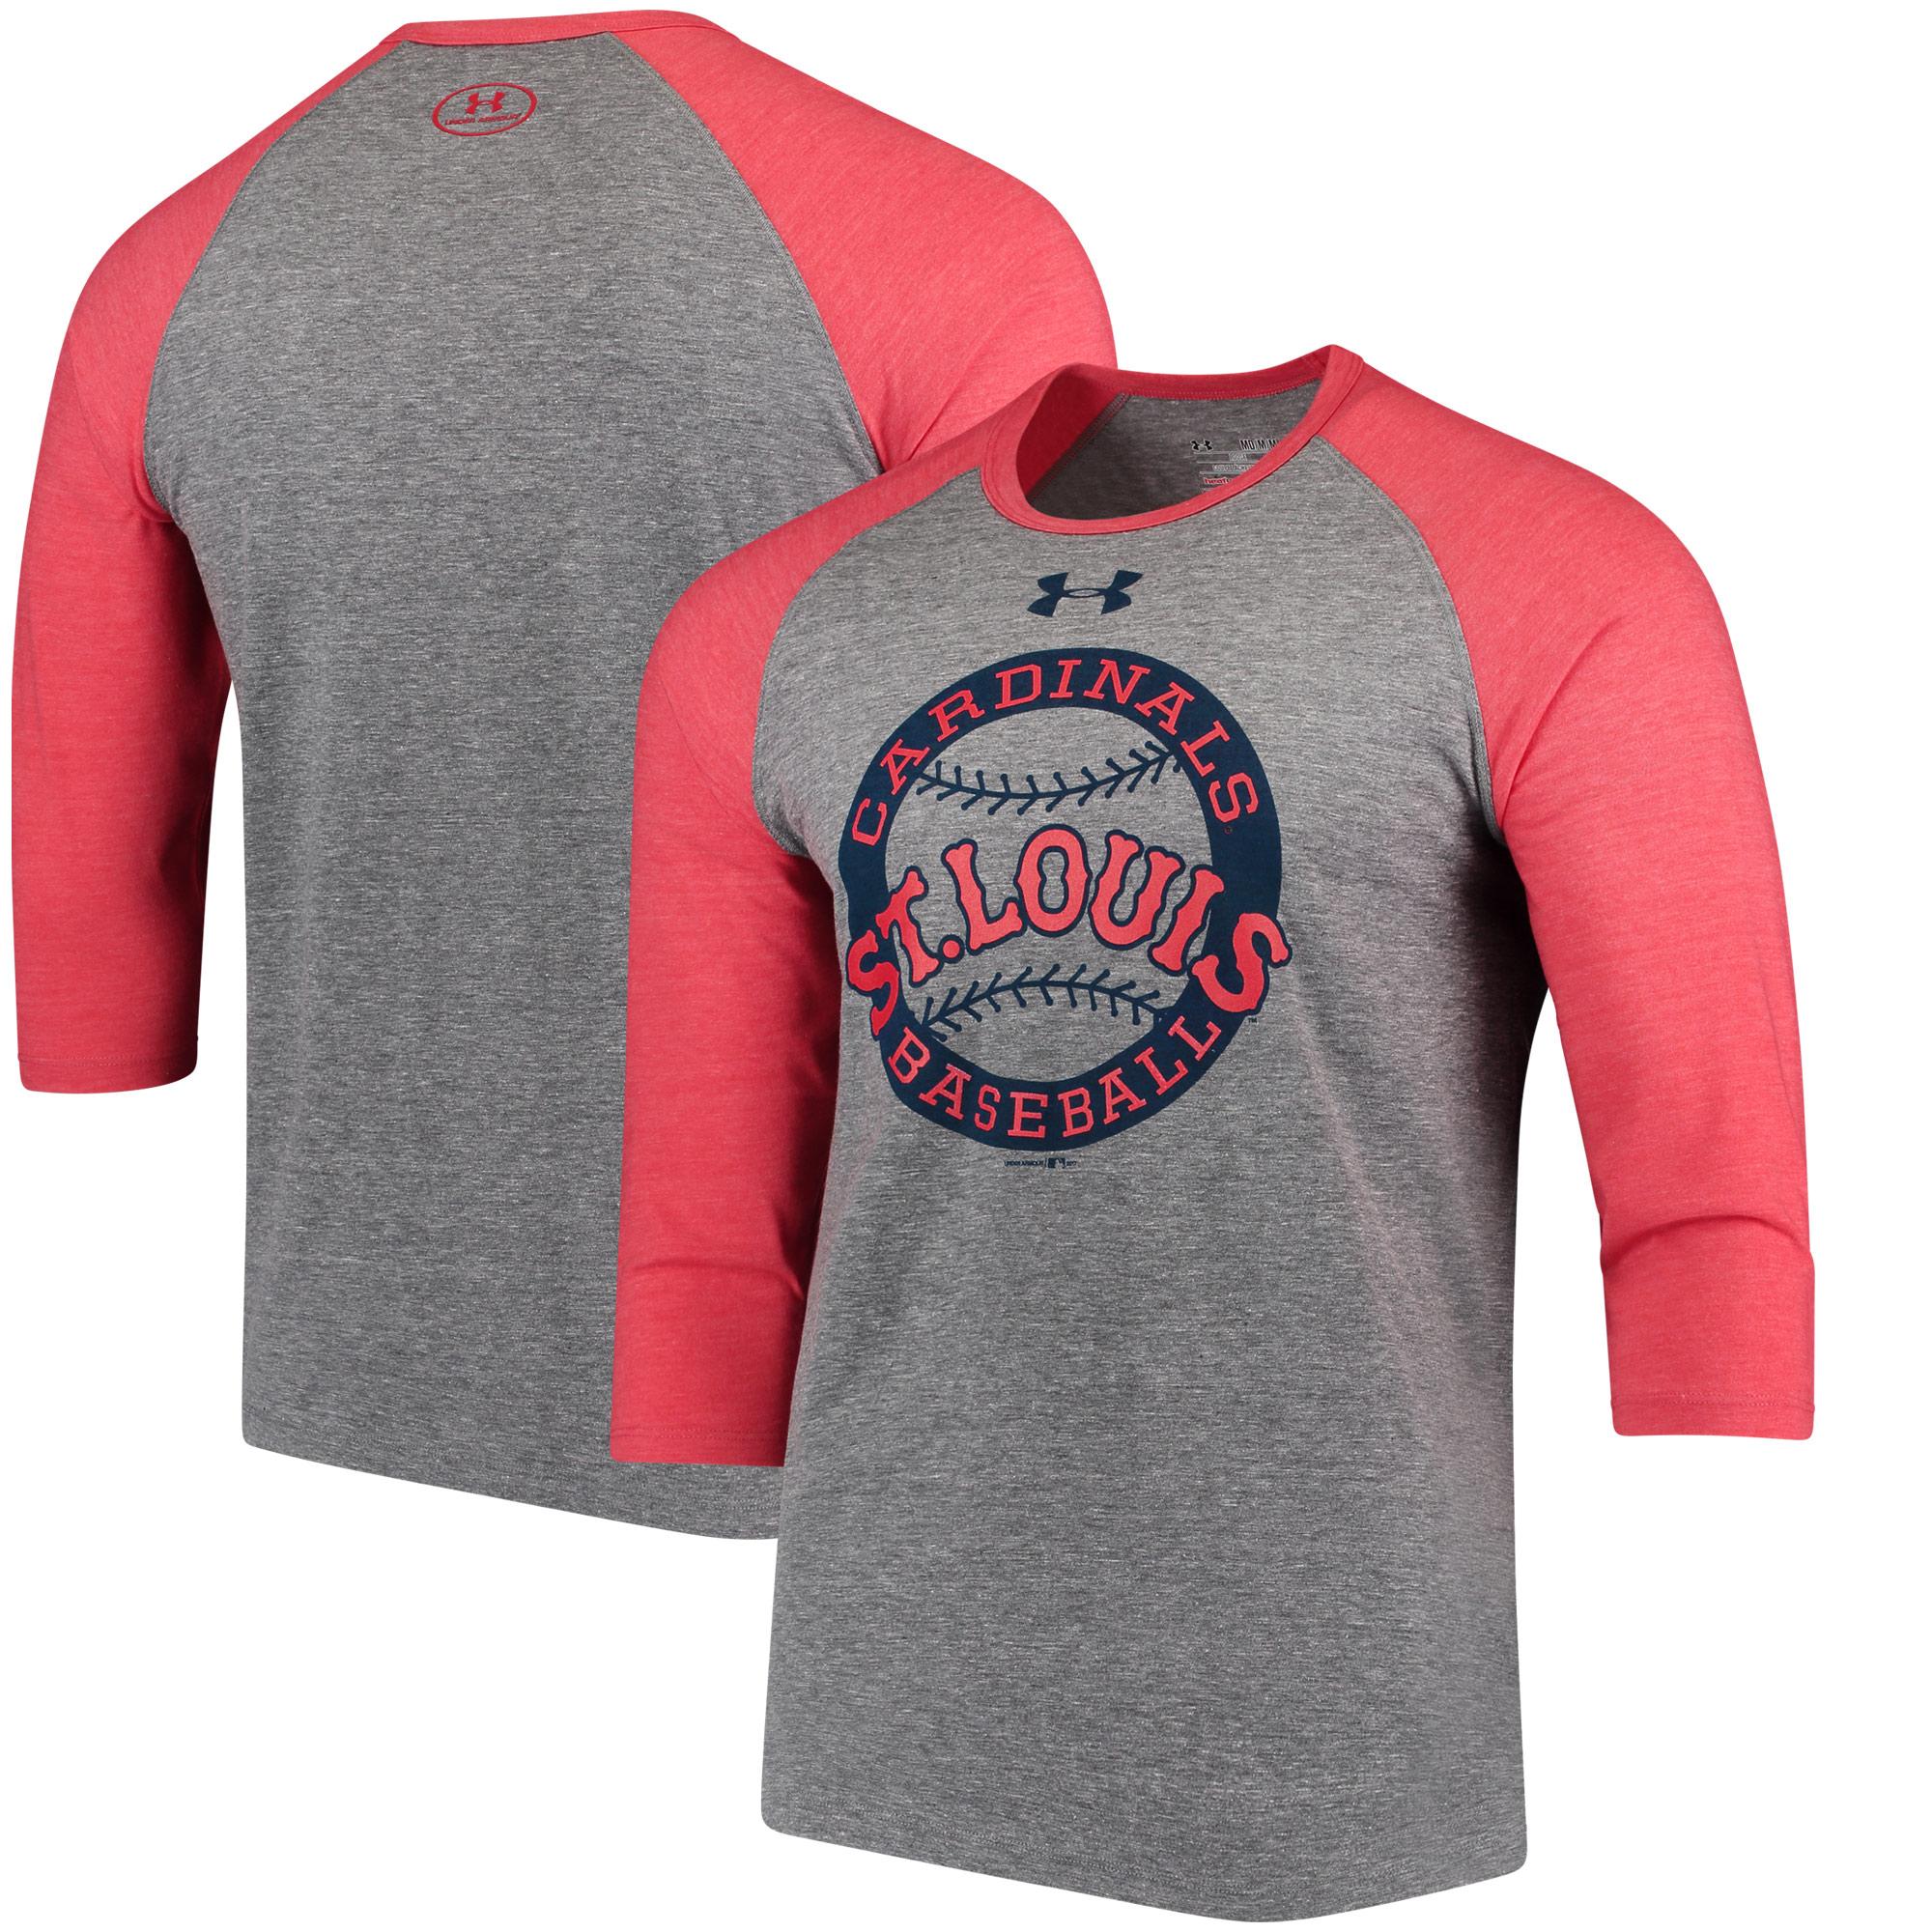 St. Louis Cardinals Under Armour Baseball 3/4-Sleeve Tri-Blend Performance T-Shirt - Gray/Red